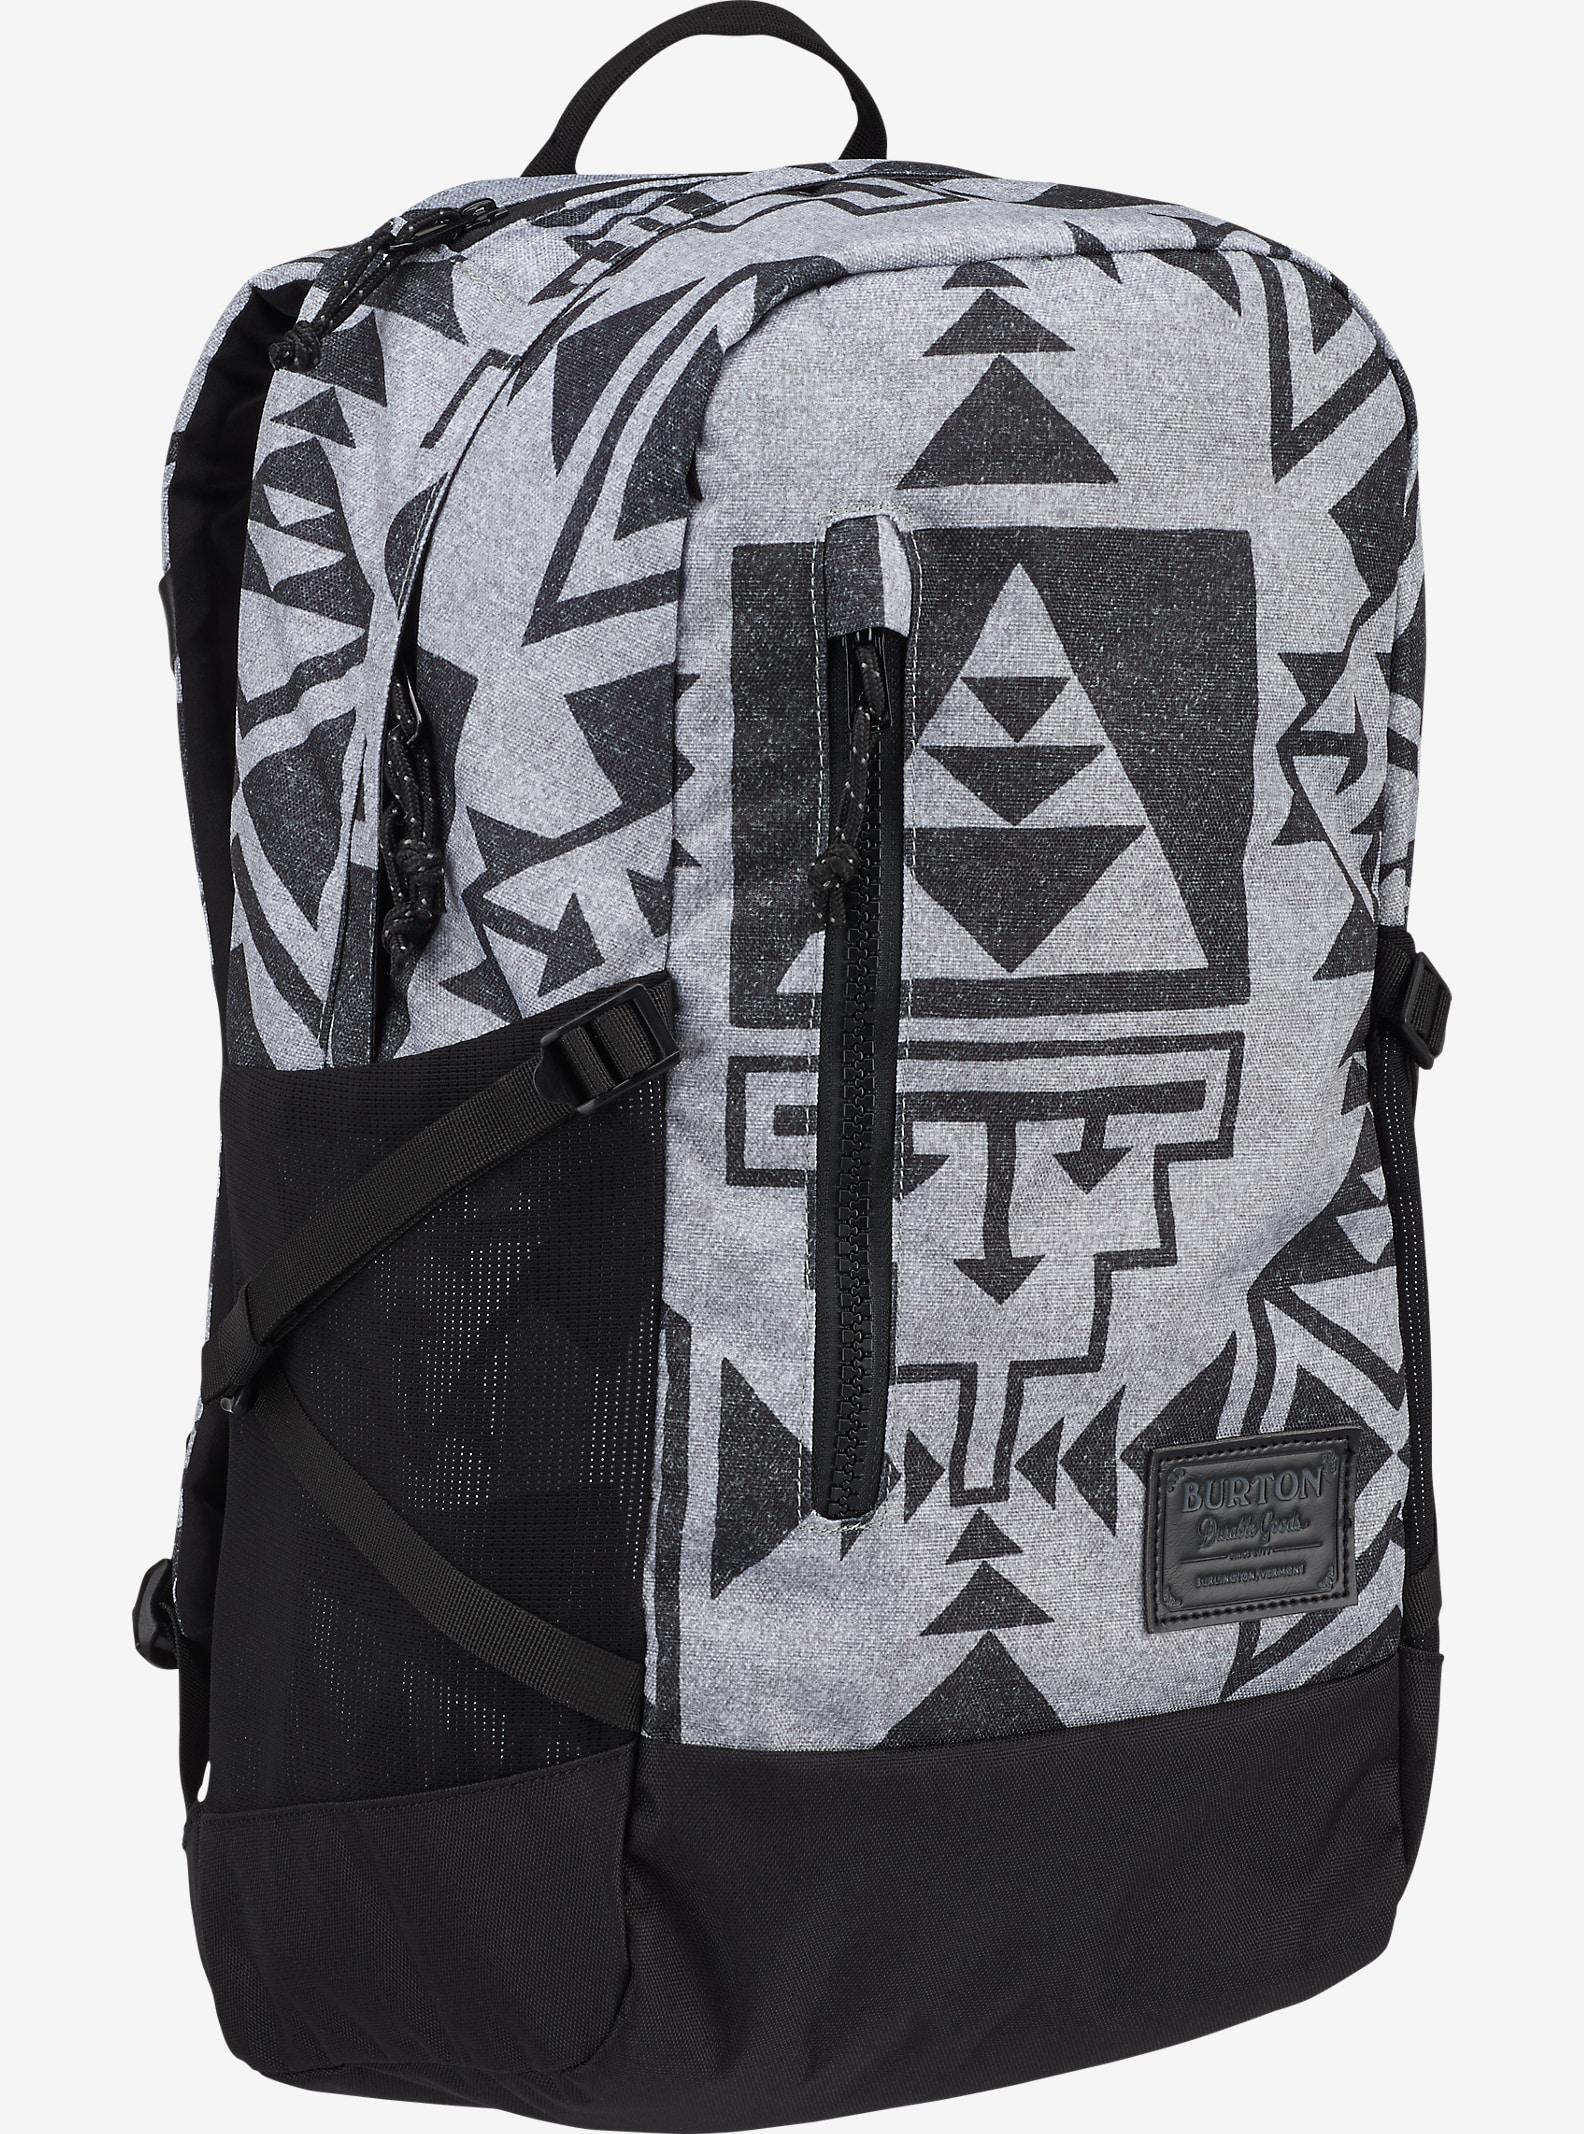 Burton Women's Prospect Backpack shown in Neu Nordic Print